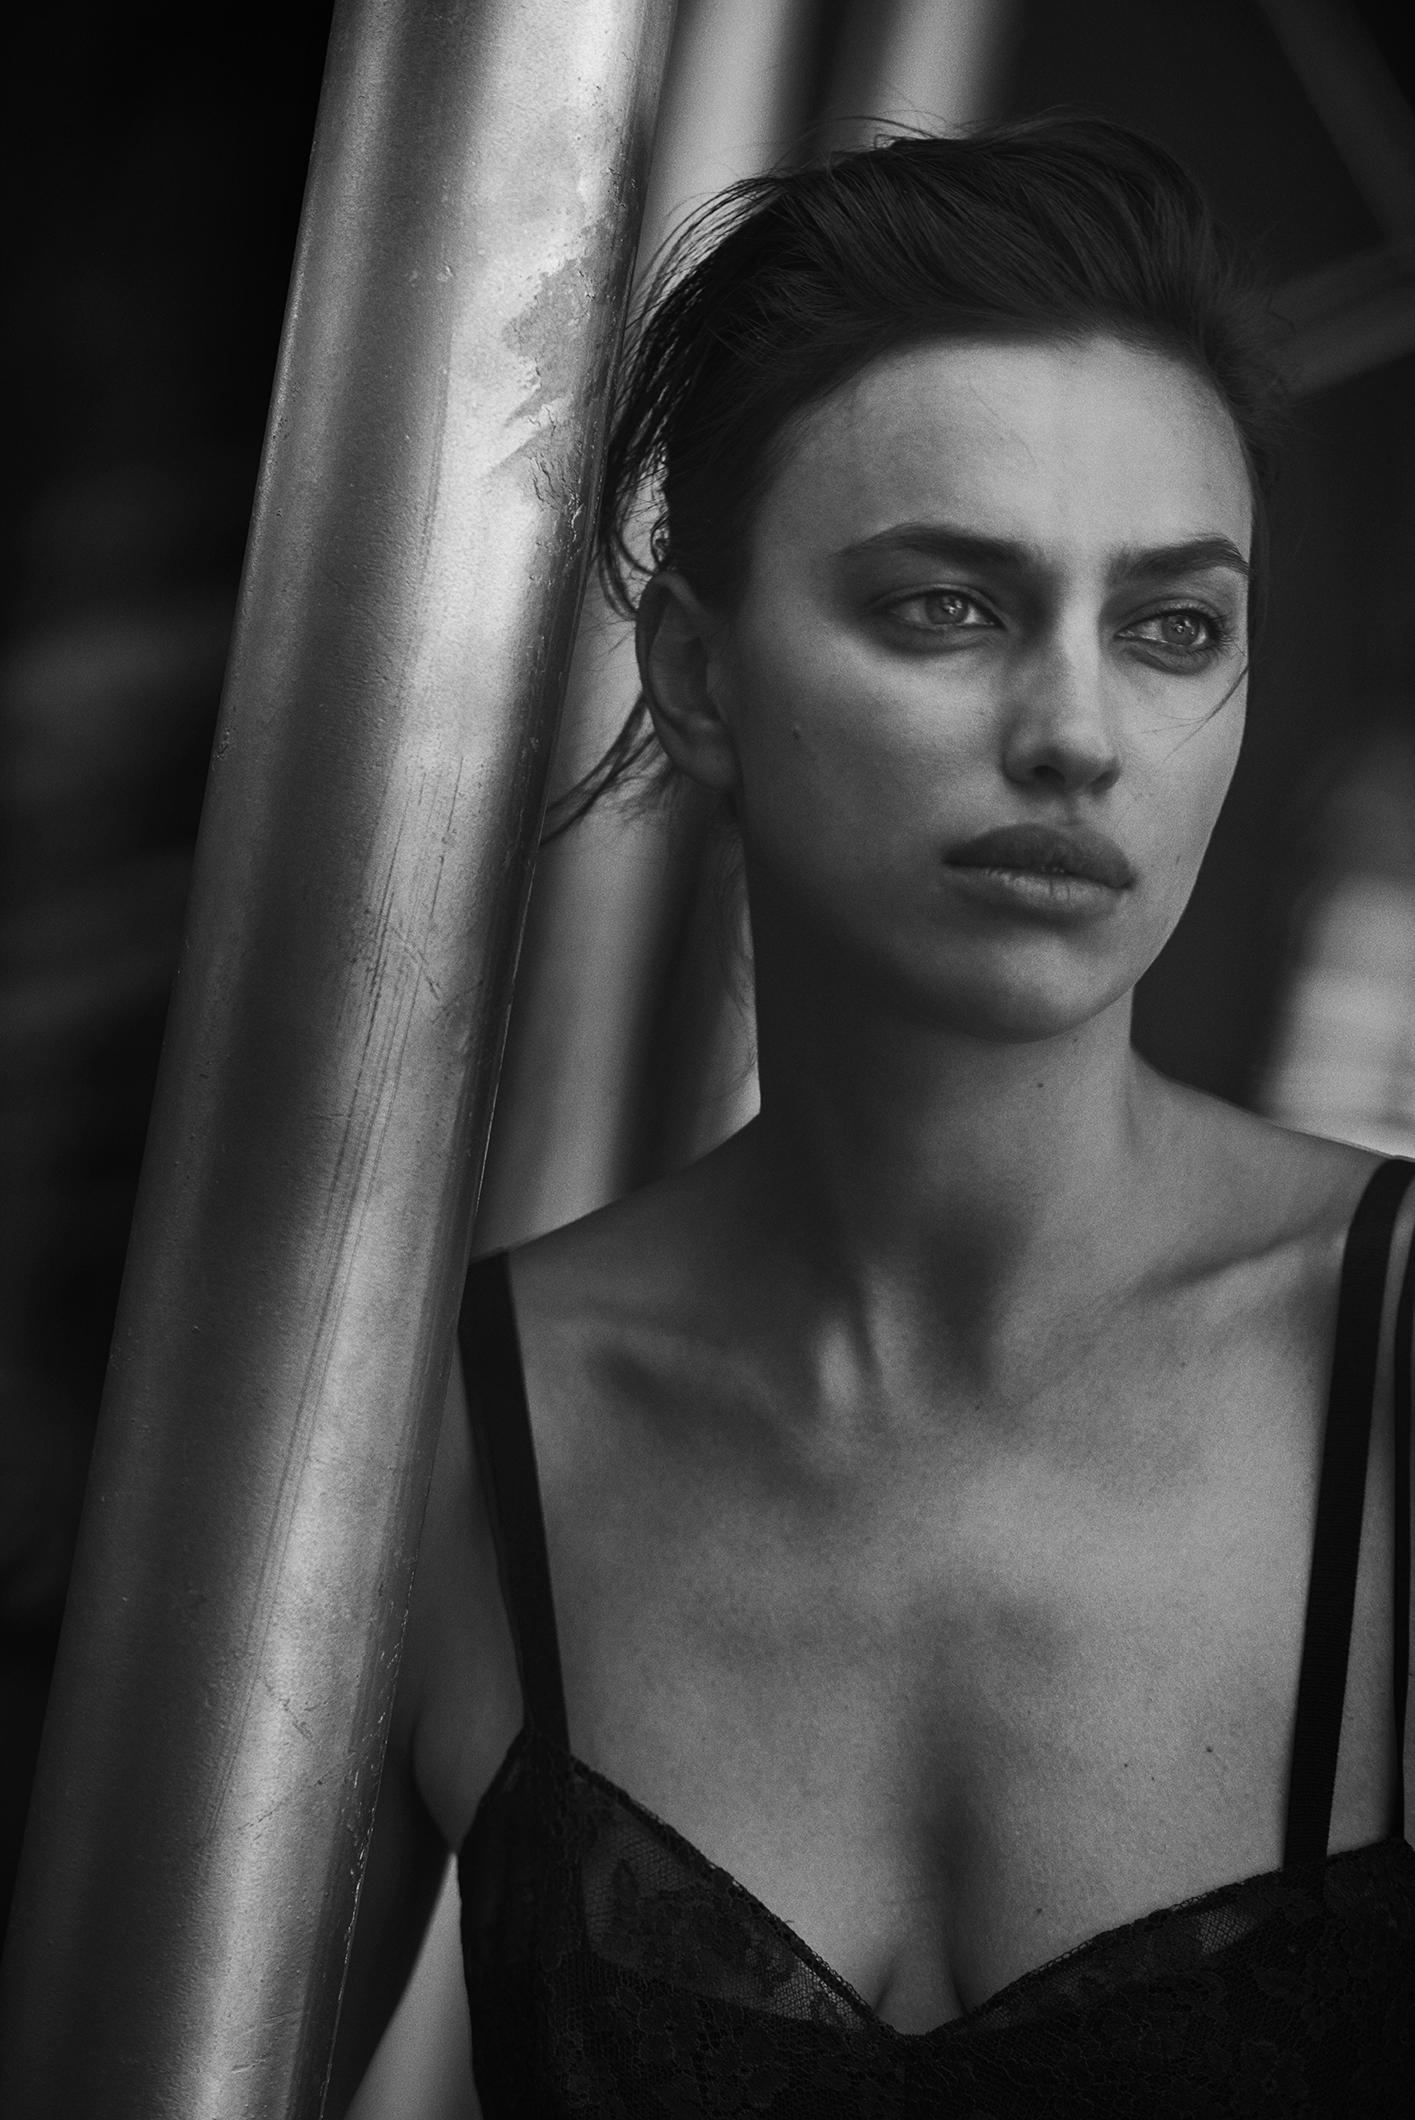 Irina Shayk - Fotó: Peter Lindbergh